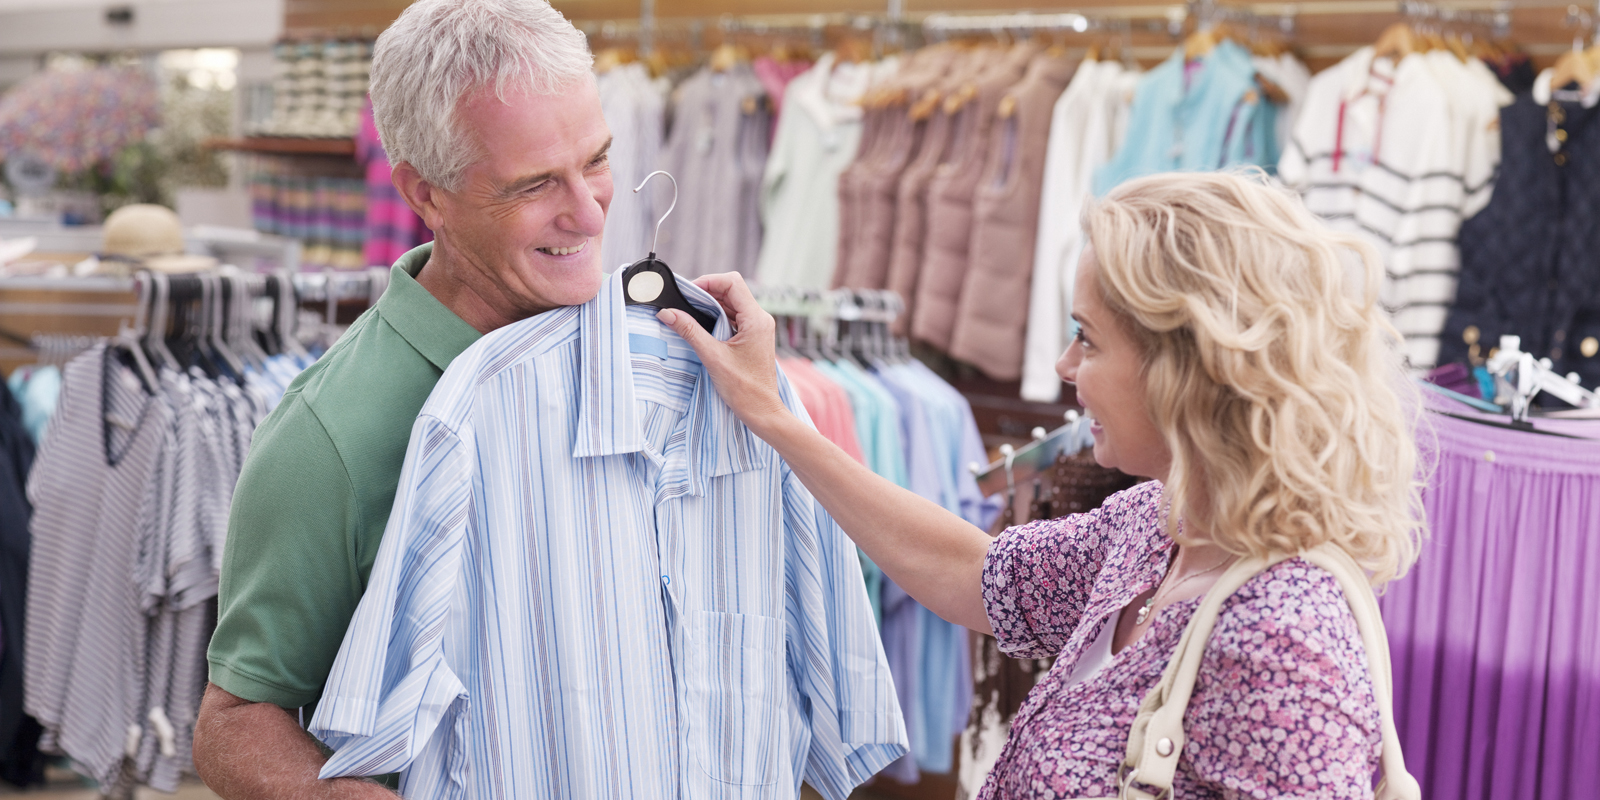 The Baby Boomer & Retail